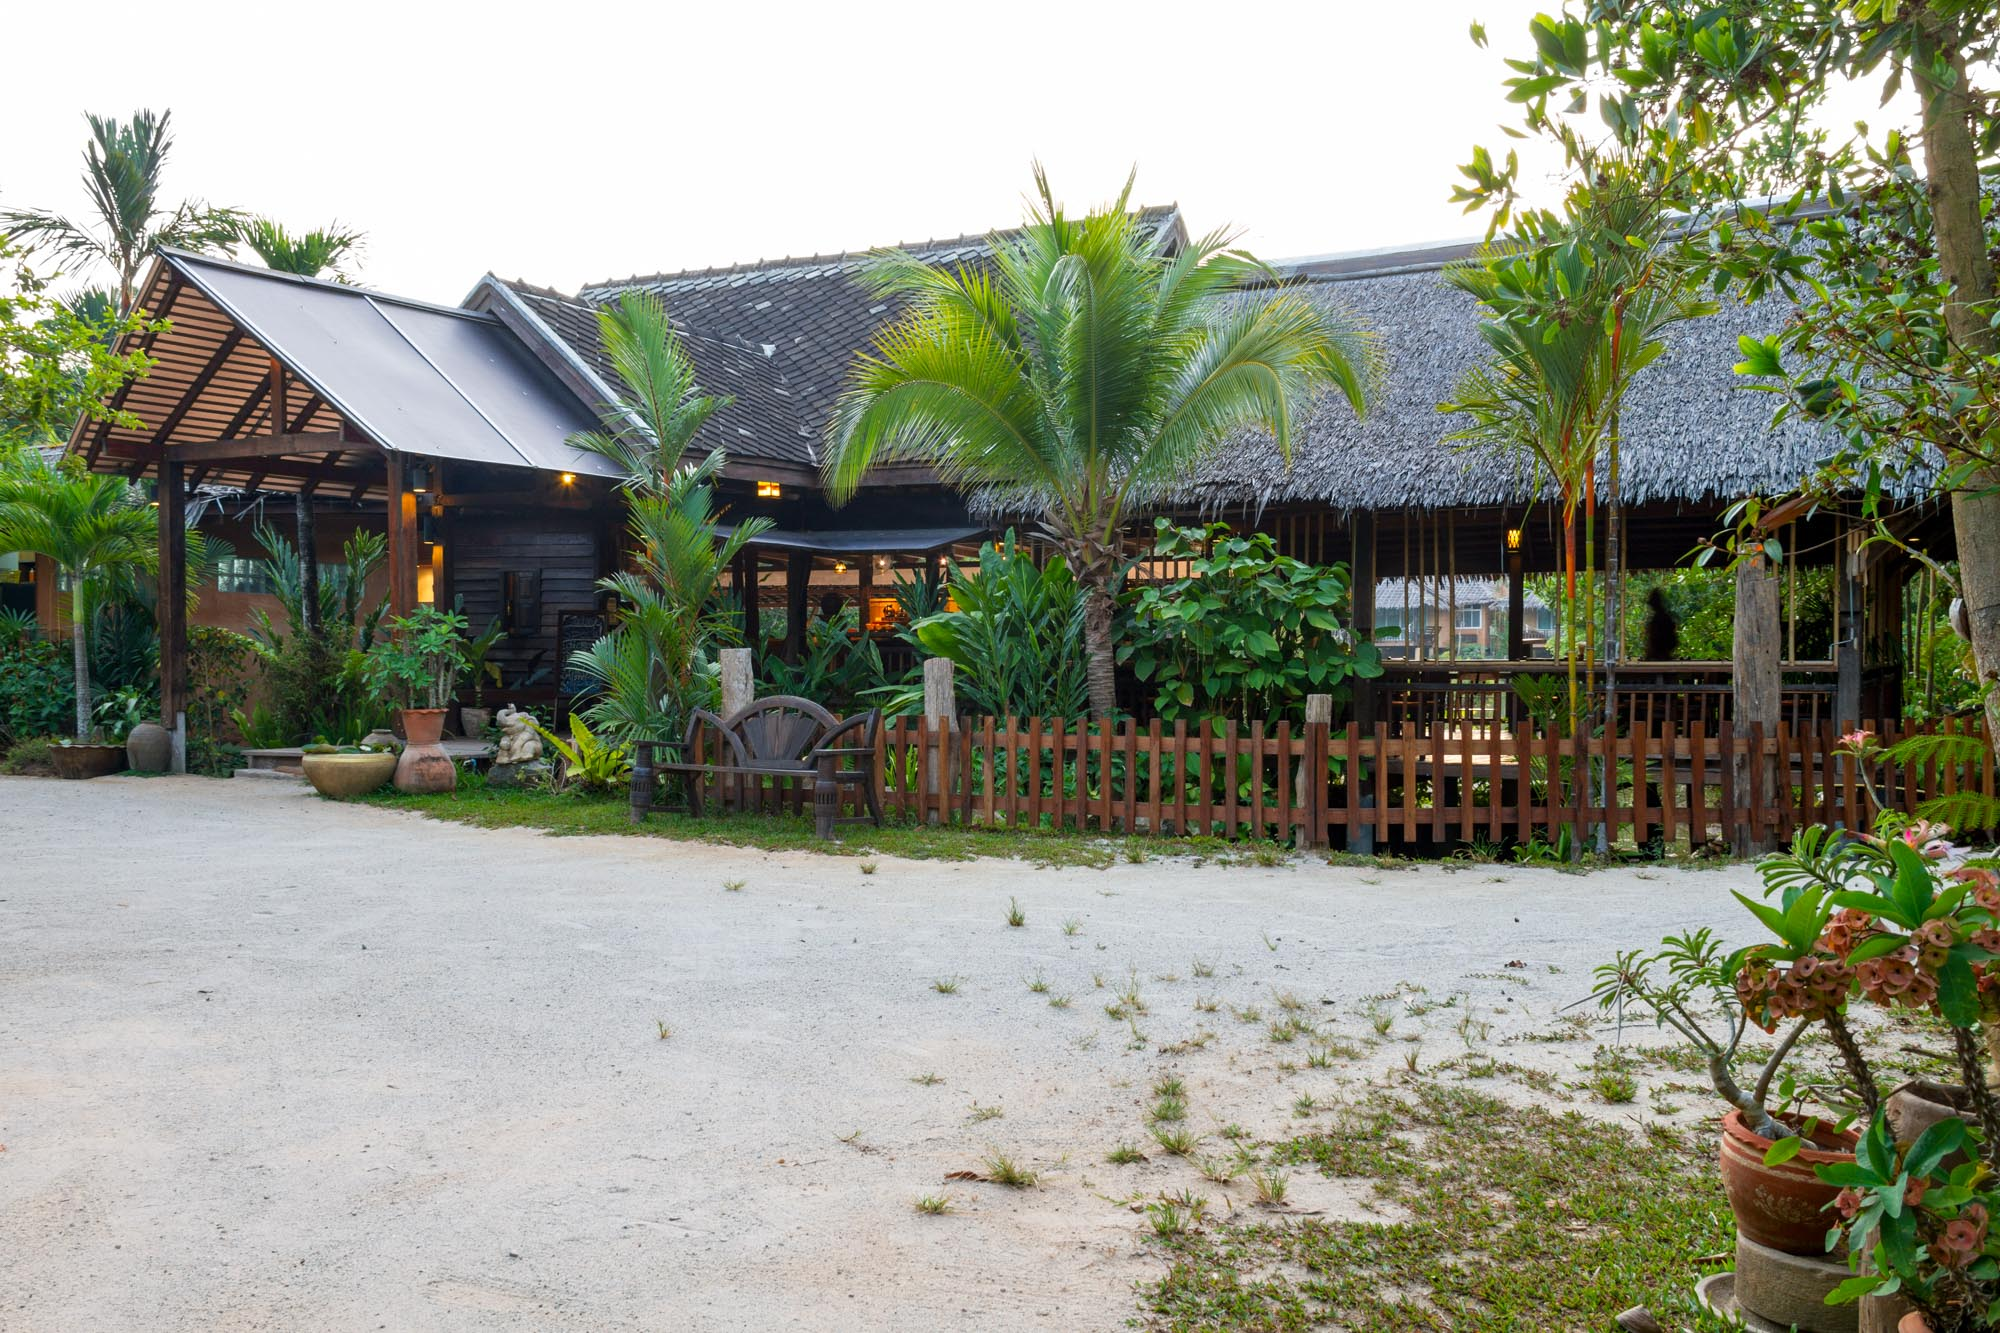 Ban Sainai Resort, Ao Nang Beach, Thailand  บ้านใสใน รีสอร์ท Ban Sainai Resort อ่าวนาง กระบี่ IMG 0295